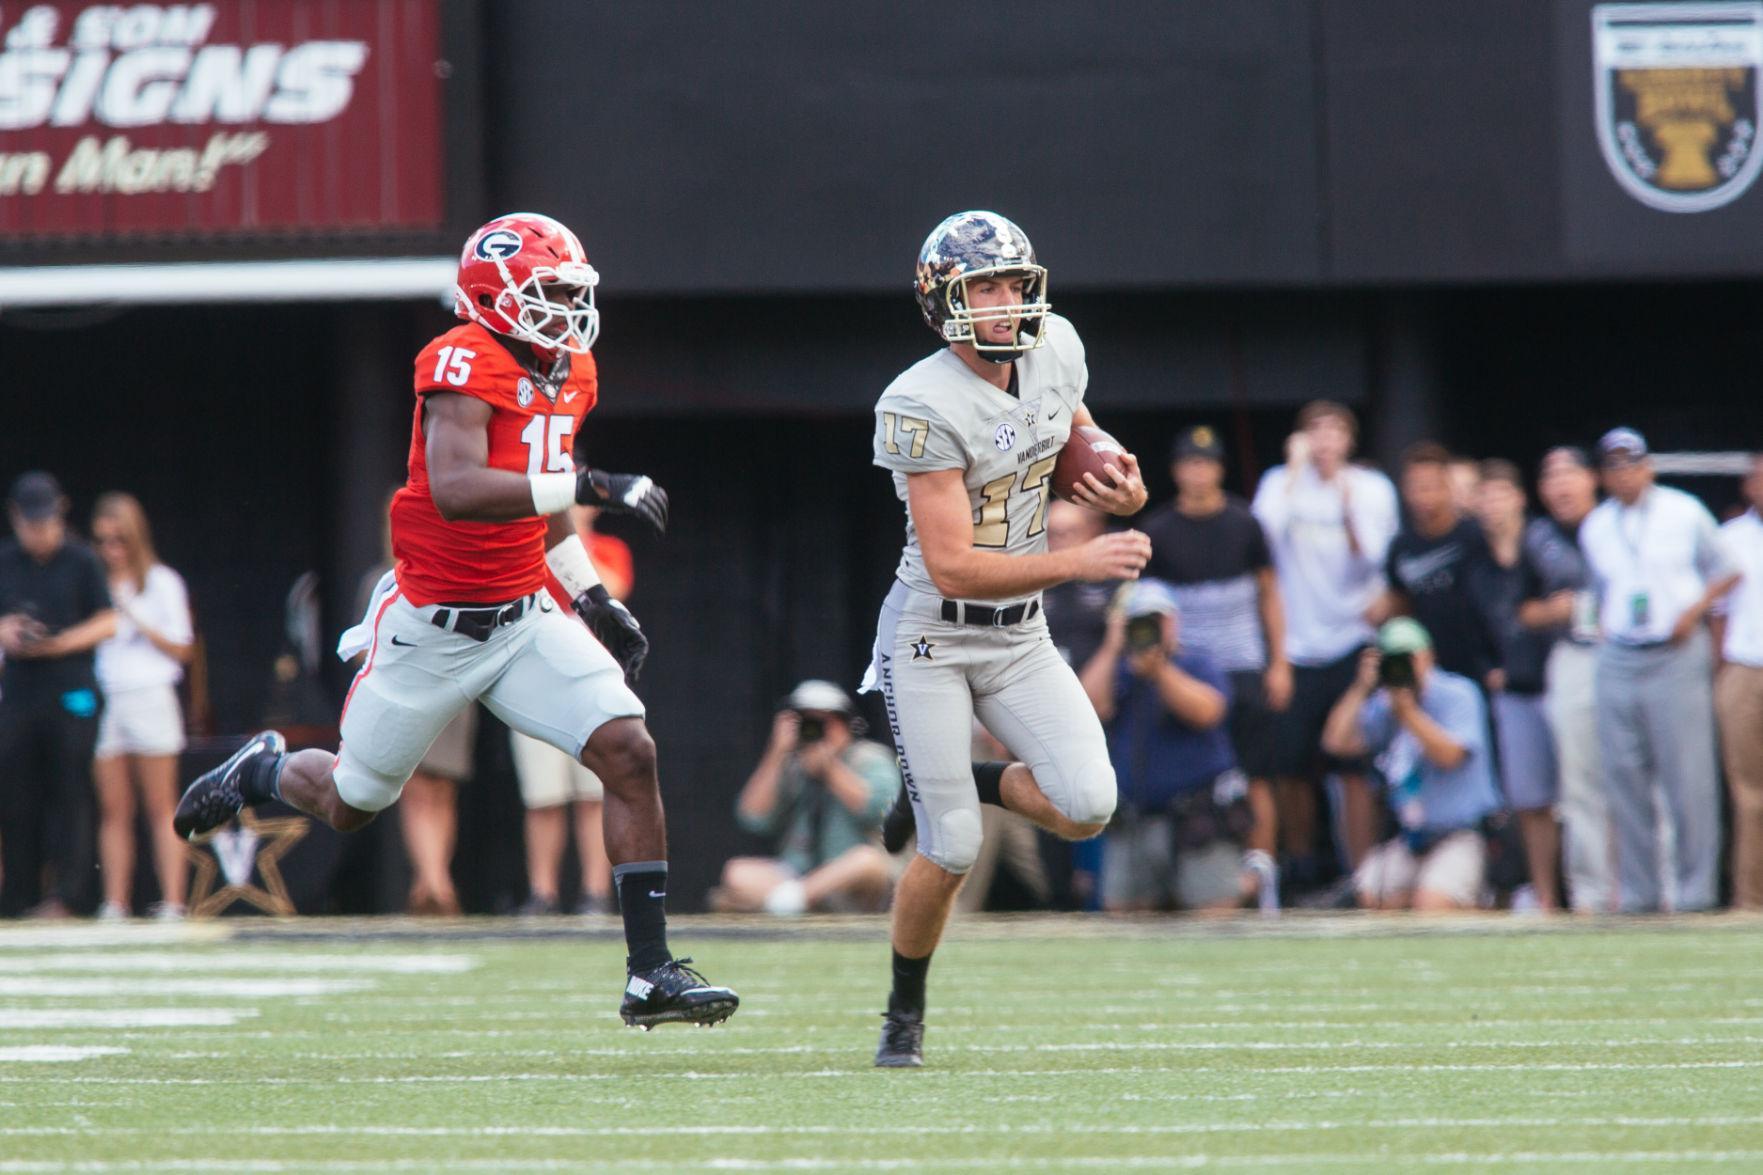 September 12, 2015: Vanderbilt hosts Georgia at Dudley Field. The Commodores fell to the Bulldogs 31-14. (Bosley Jarrett)